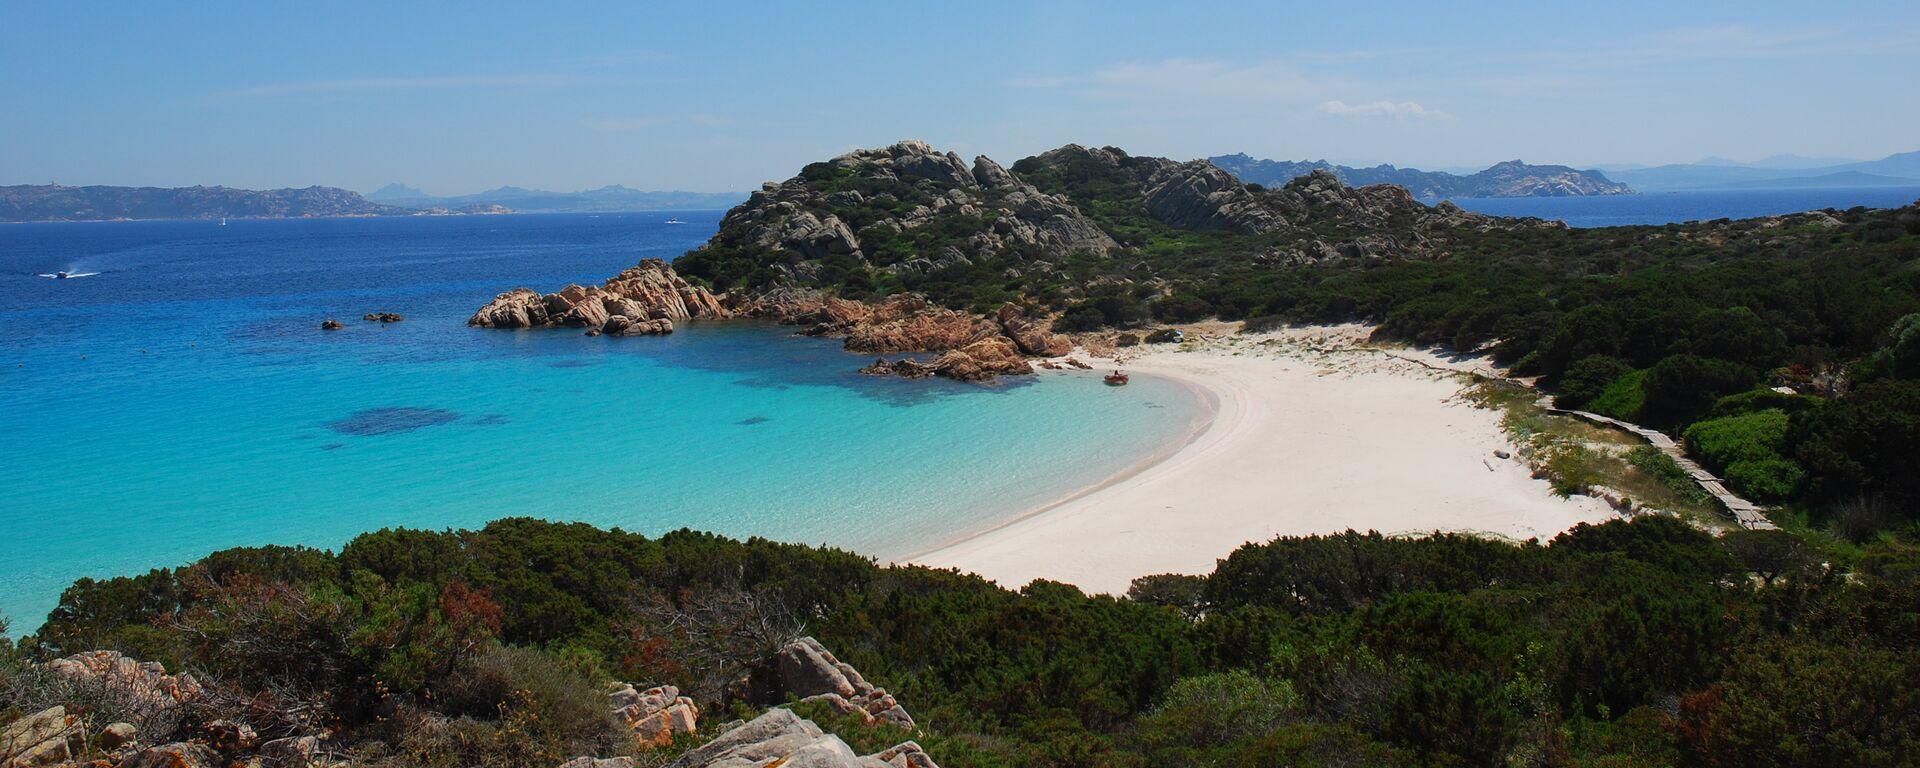 Spiaggia Rosa, isola di Budelli, Sardegna - Sputnik Italia, 1920, 14.04.2021